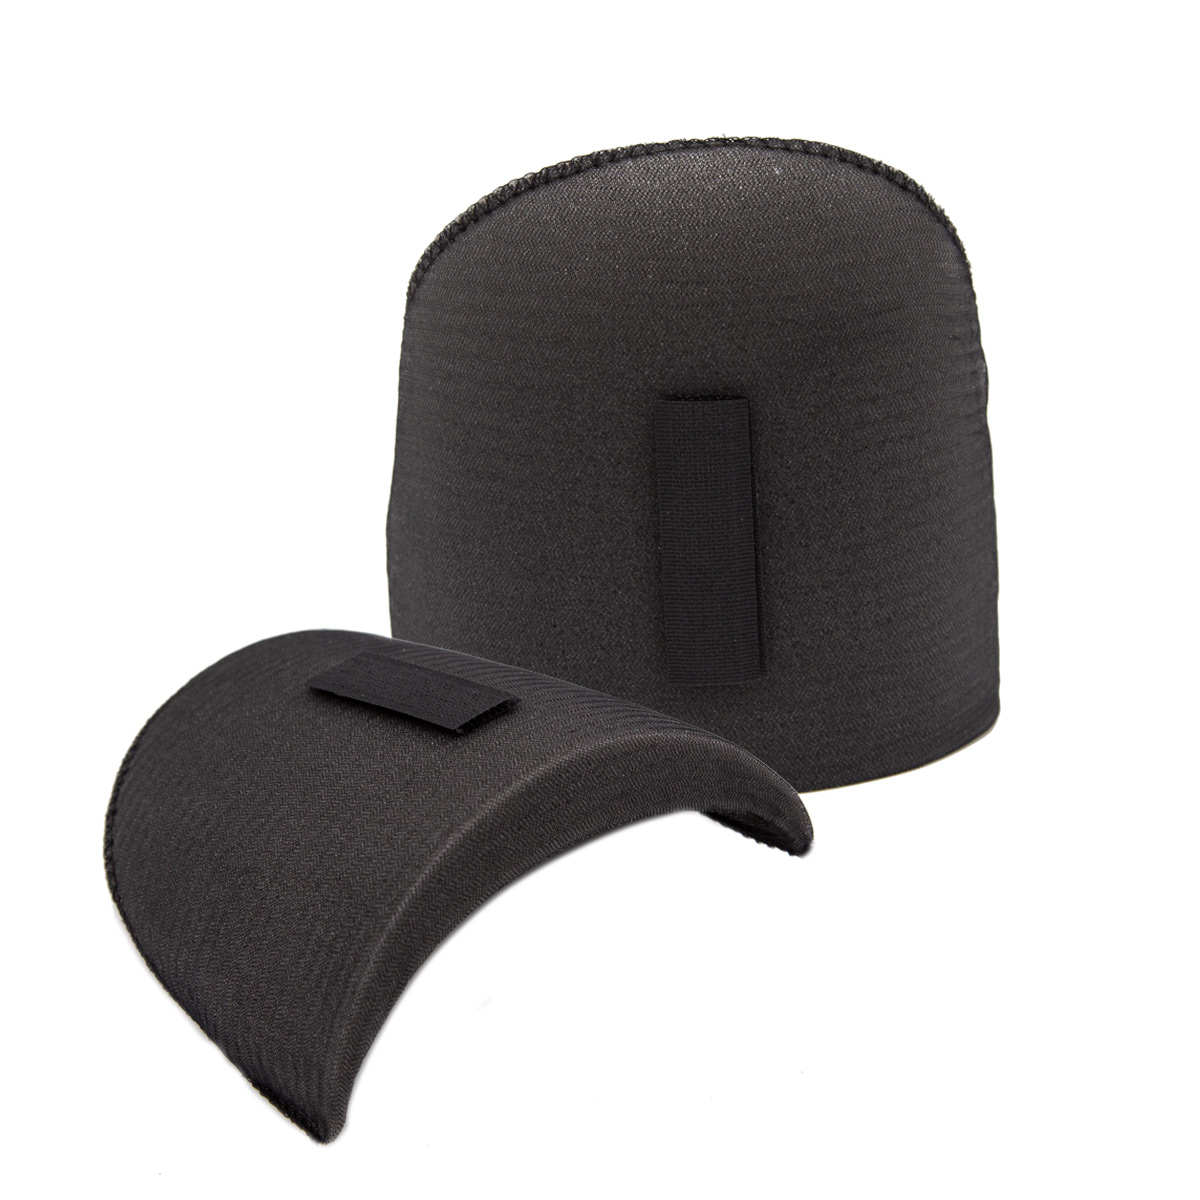 ВК-18/А Плечевые накладки обшитые с конт.-лентой, втачные, 18*120*170 мм, Hobby&Pro